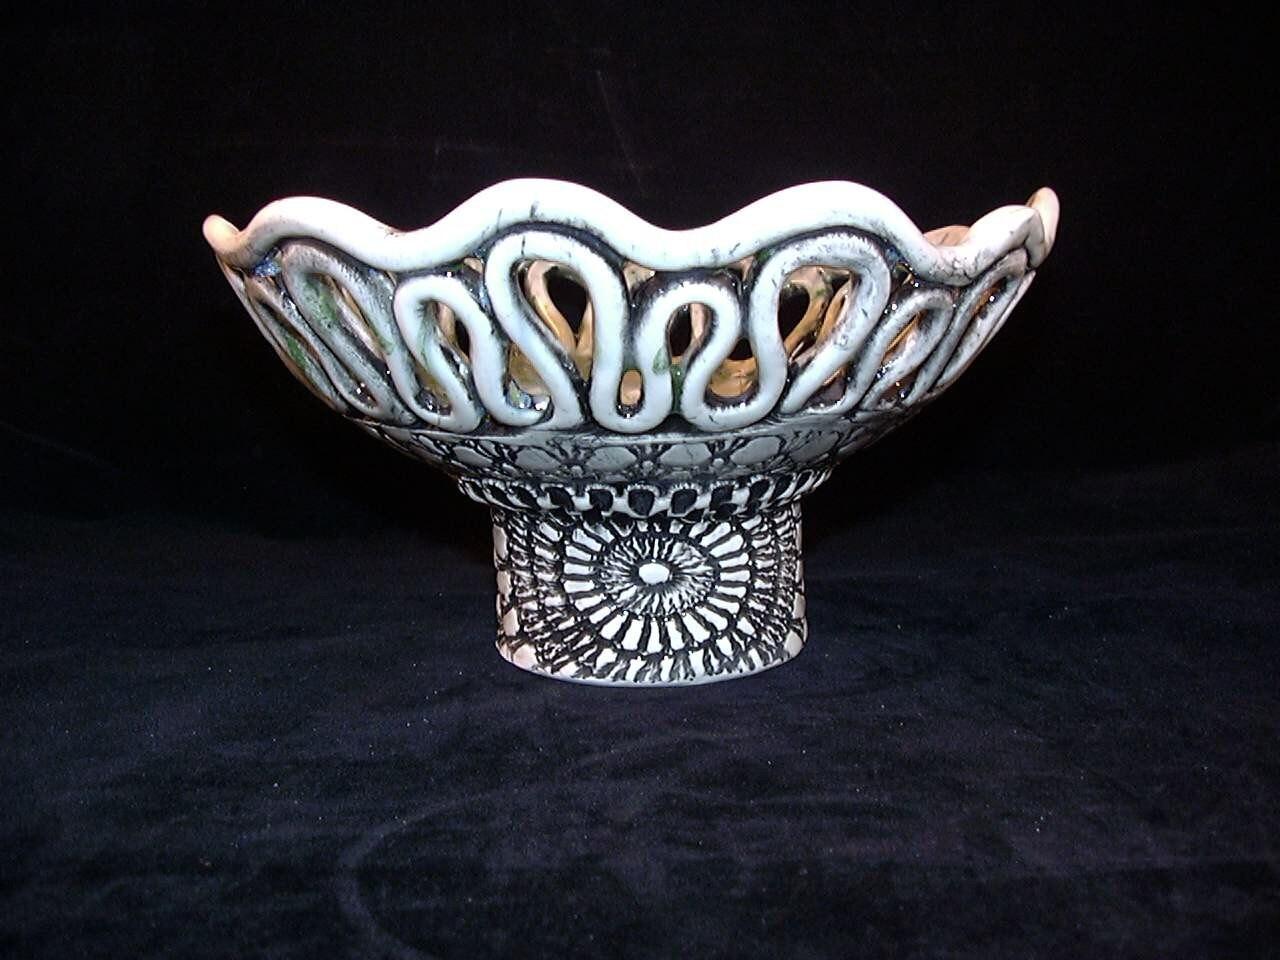 Ceramics Art Pottery Coil Pot Candleholder Candy or Soap